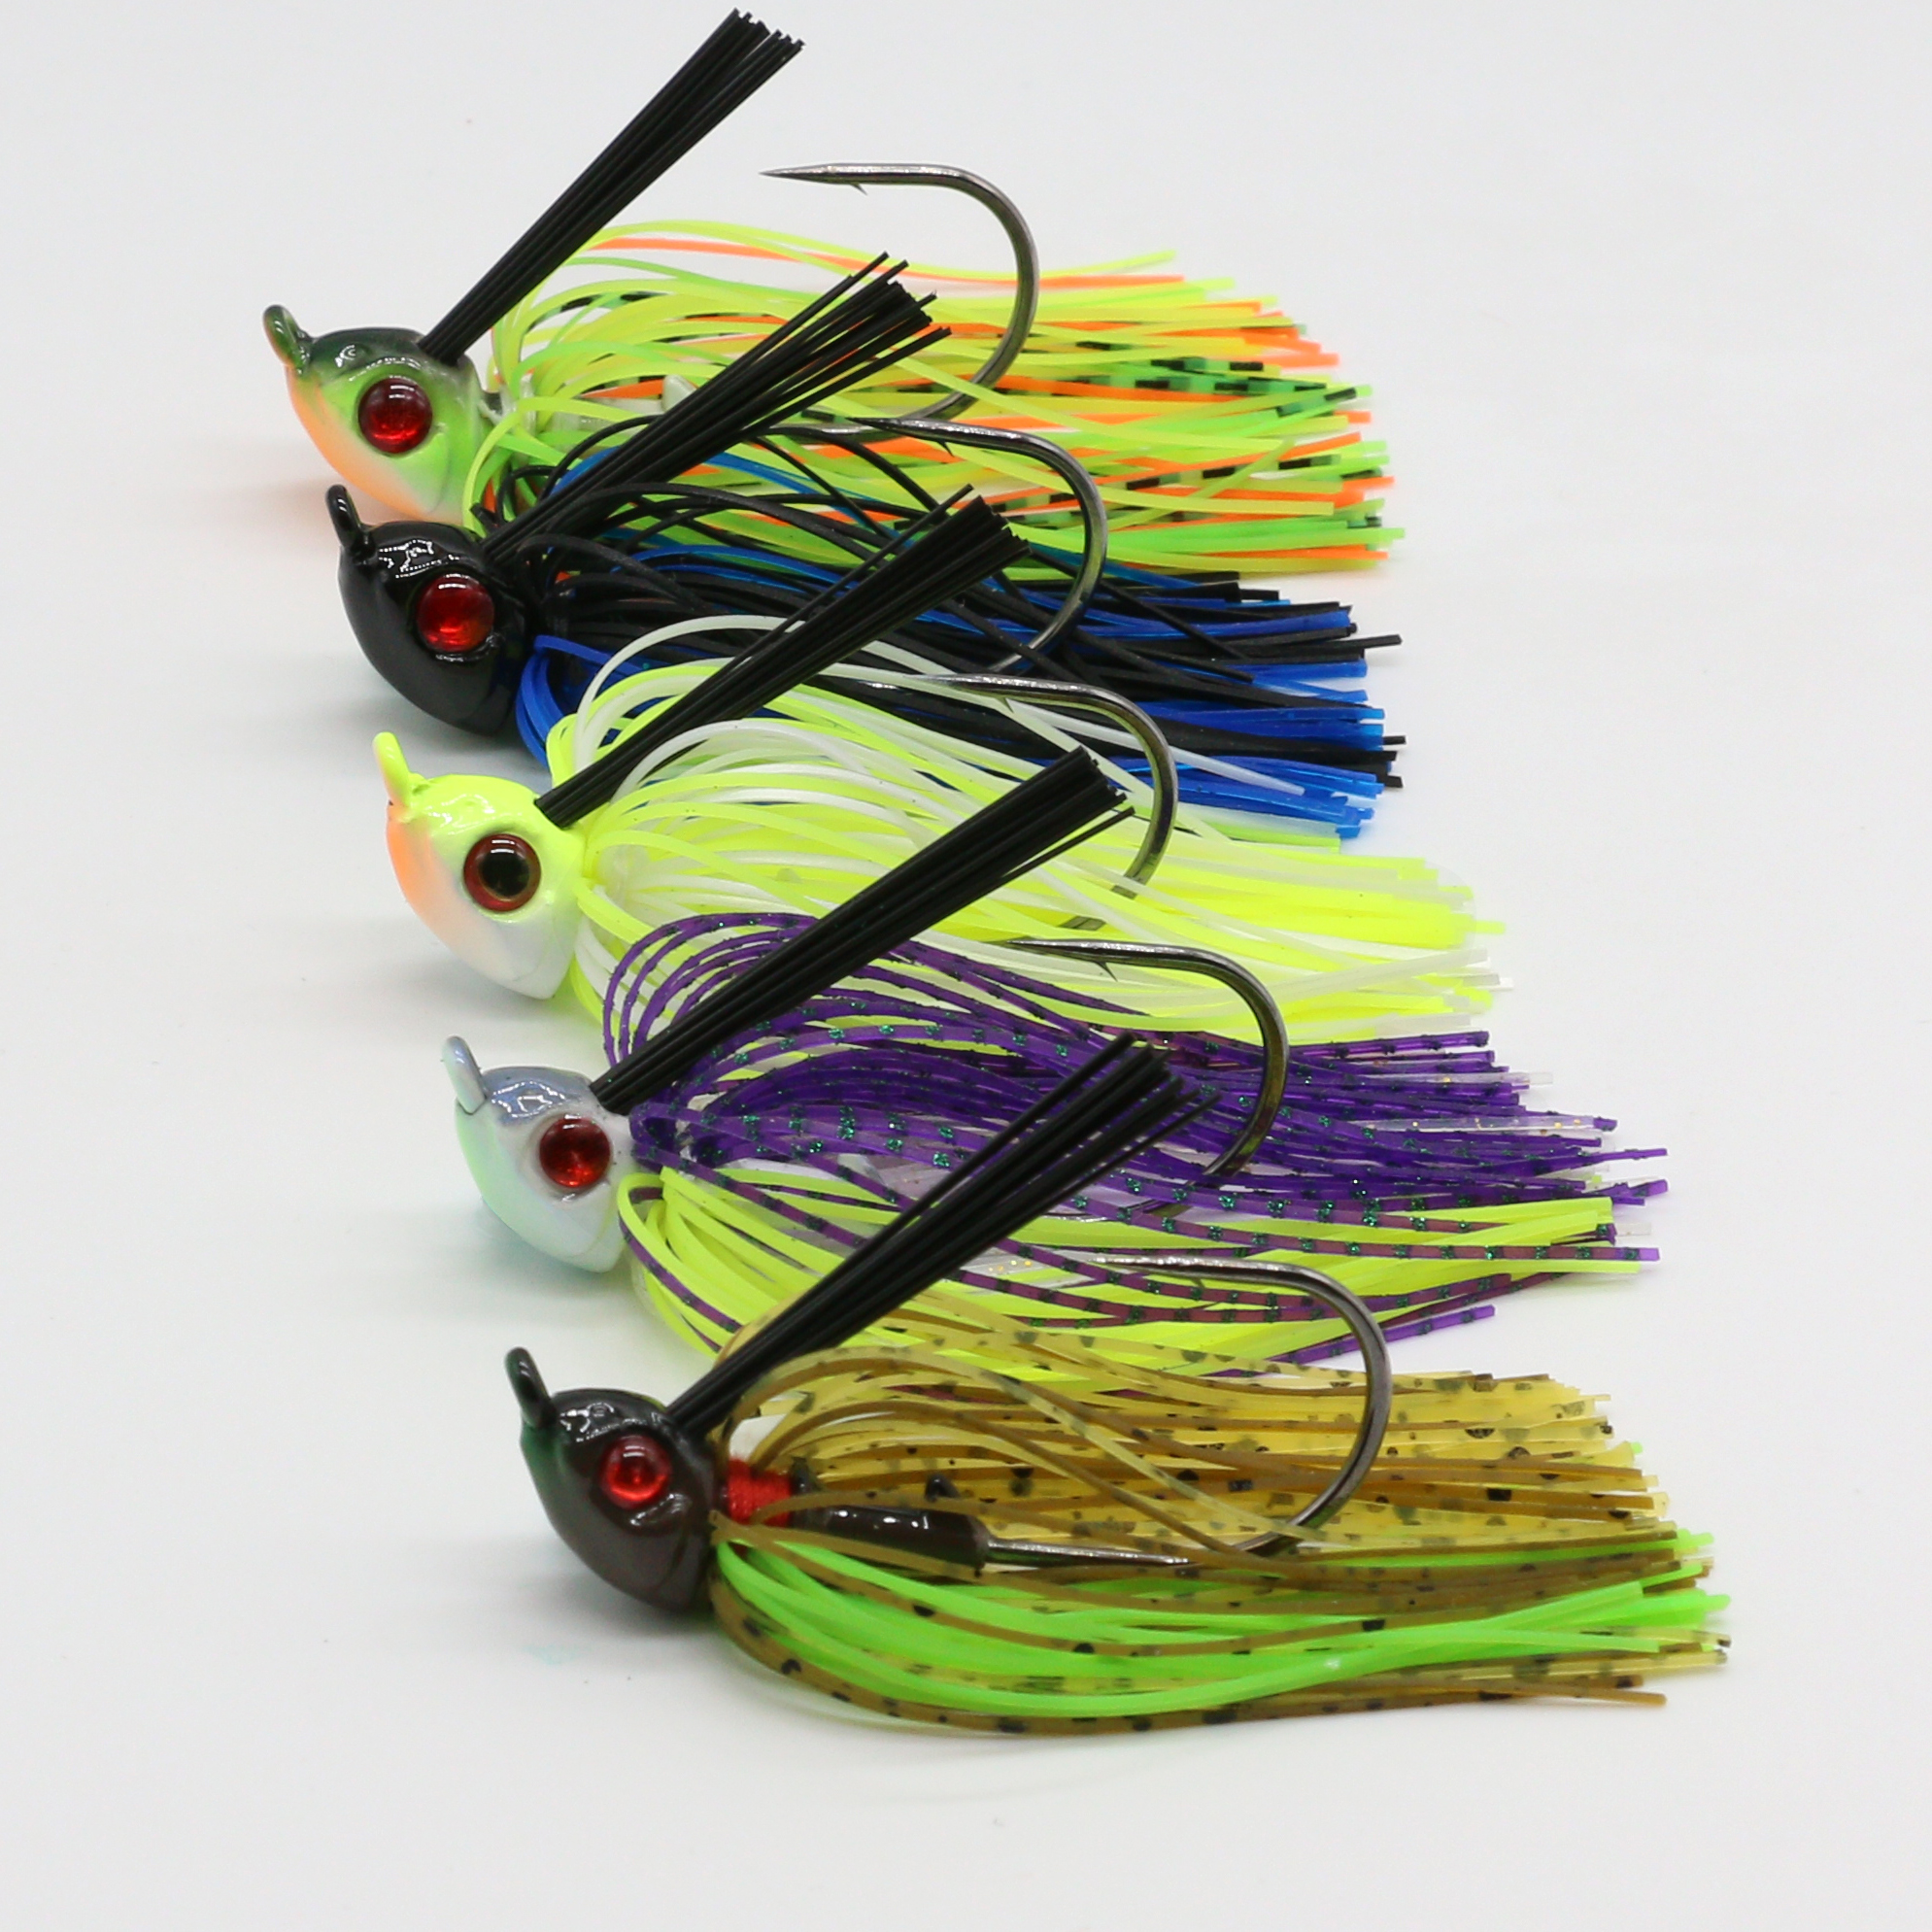 JonStar 1pc 7G/12G/15G/16G Finesse Chatter bait spinnerbait fishing lure wobbler chatterbait for bass pike walleye fishing-2